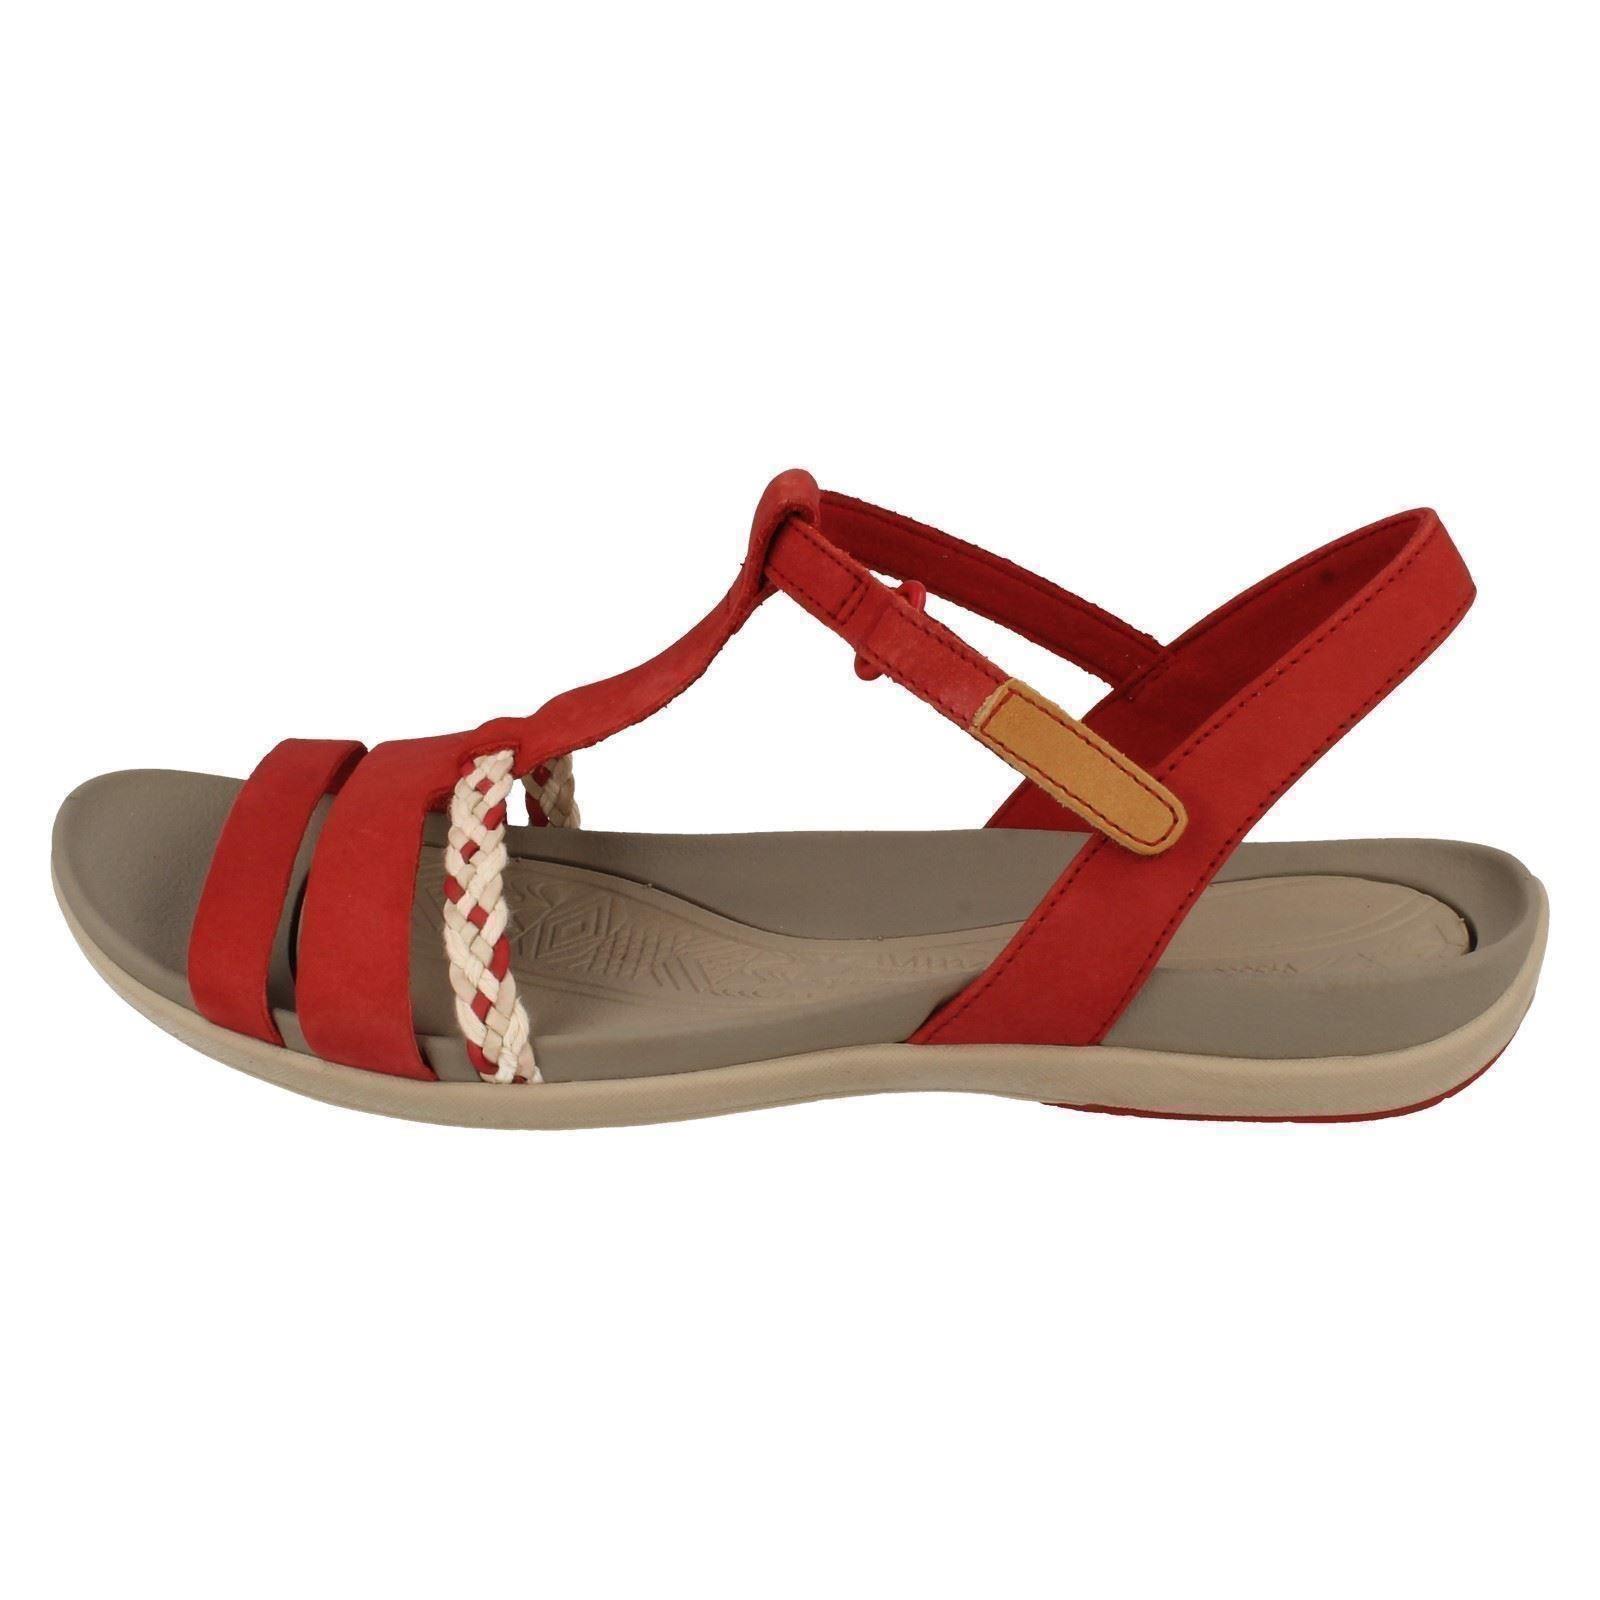 b0f2d36b370 Ladies-Clarks-Casual-Summer-Sandals-Tealite-Grace thumbnail 13